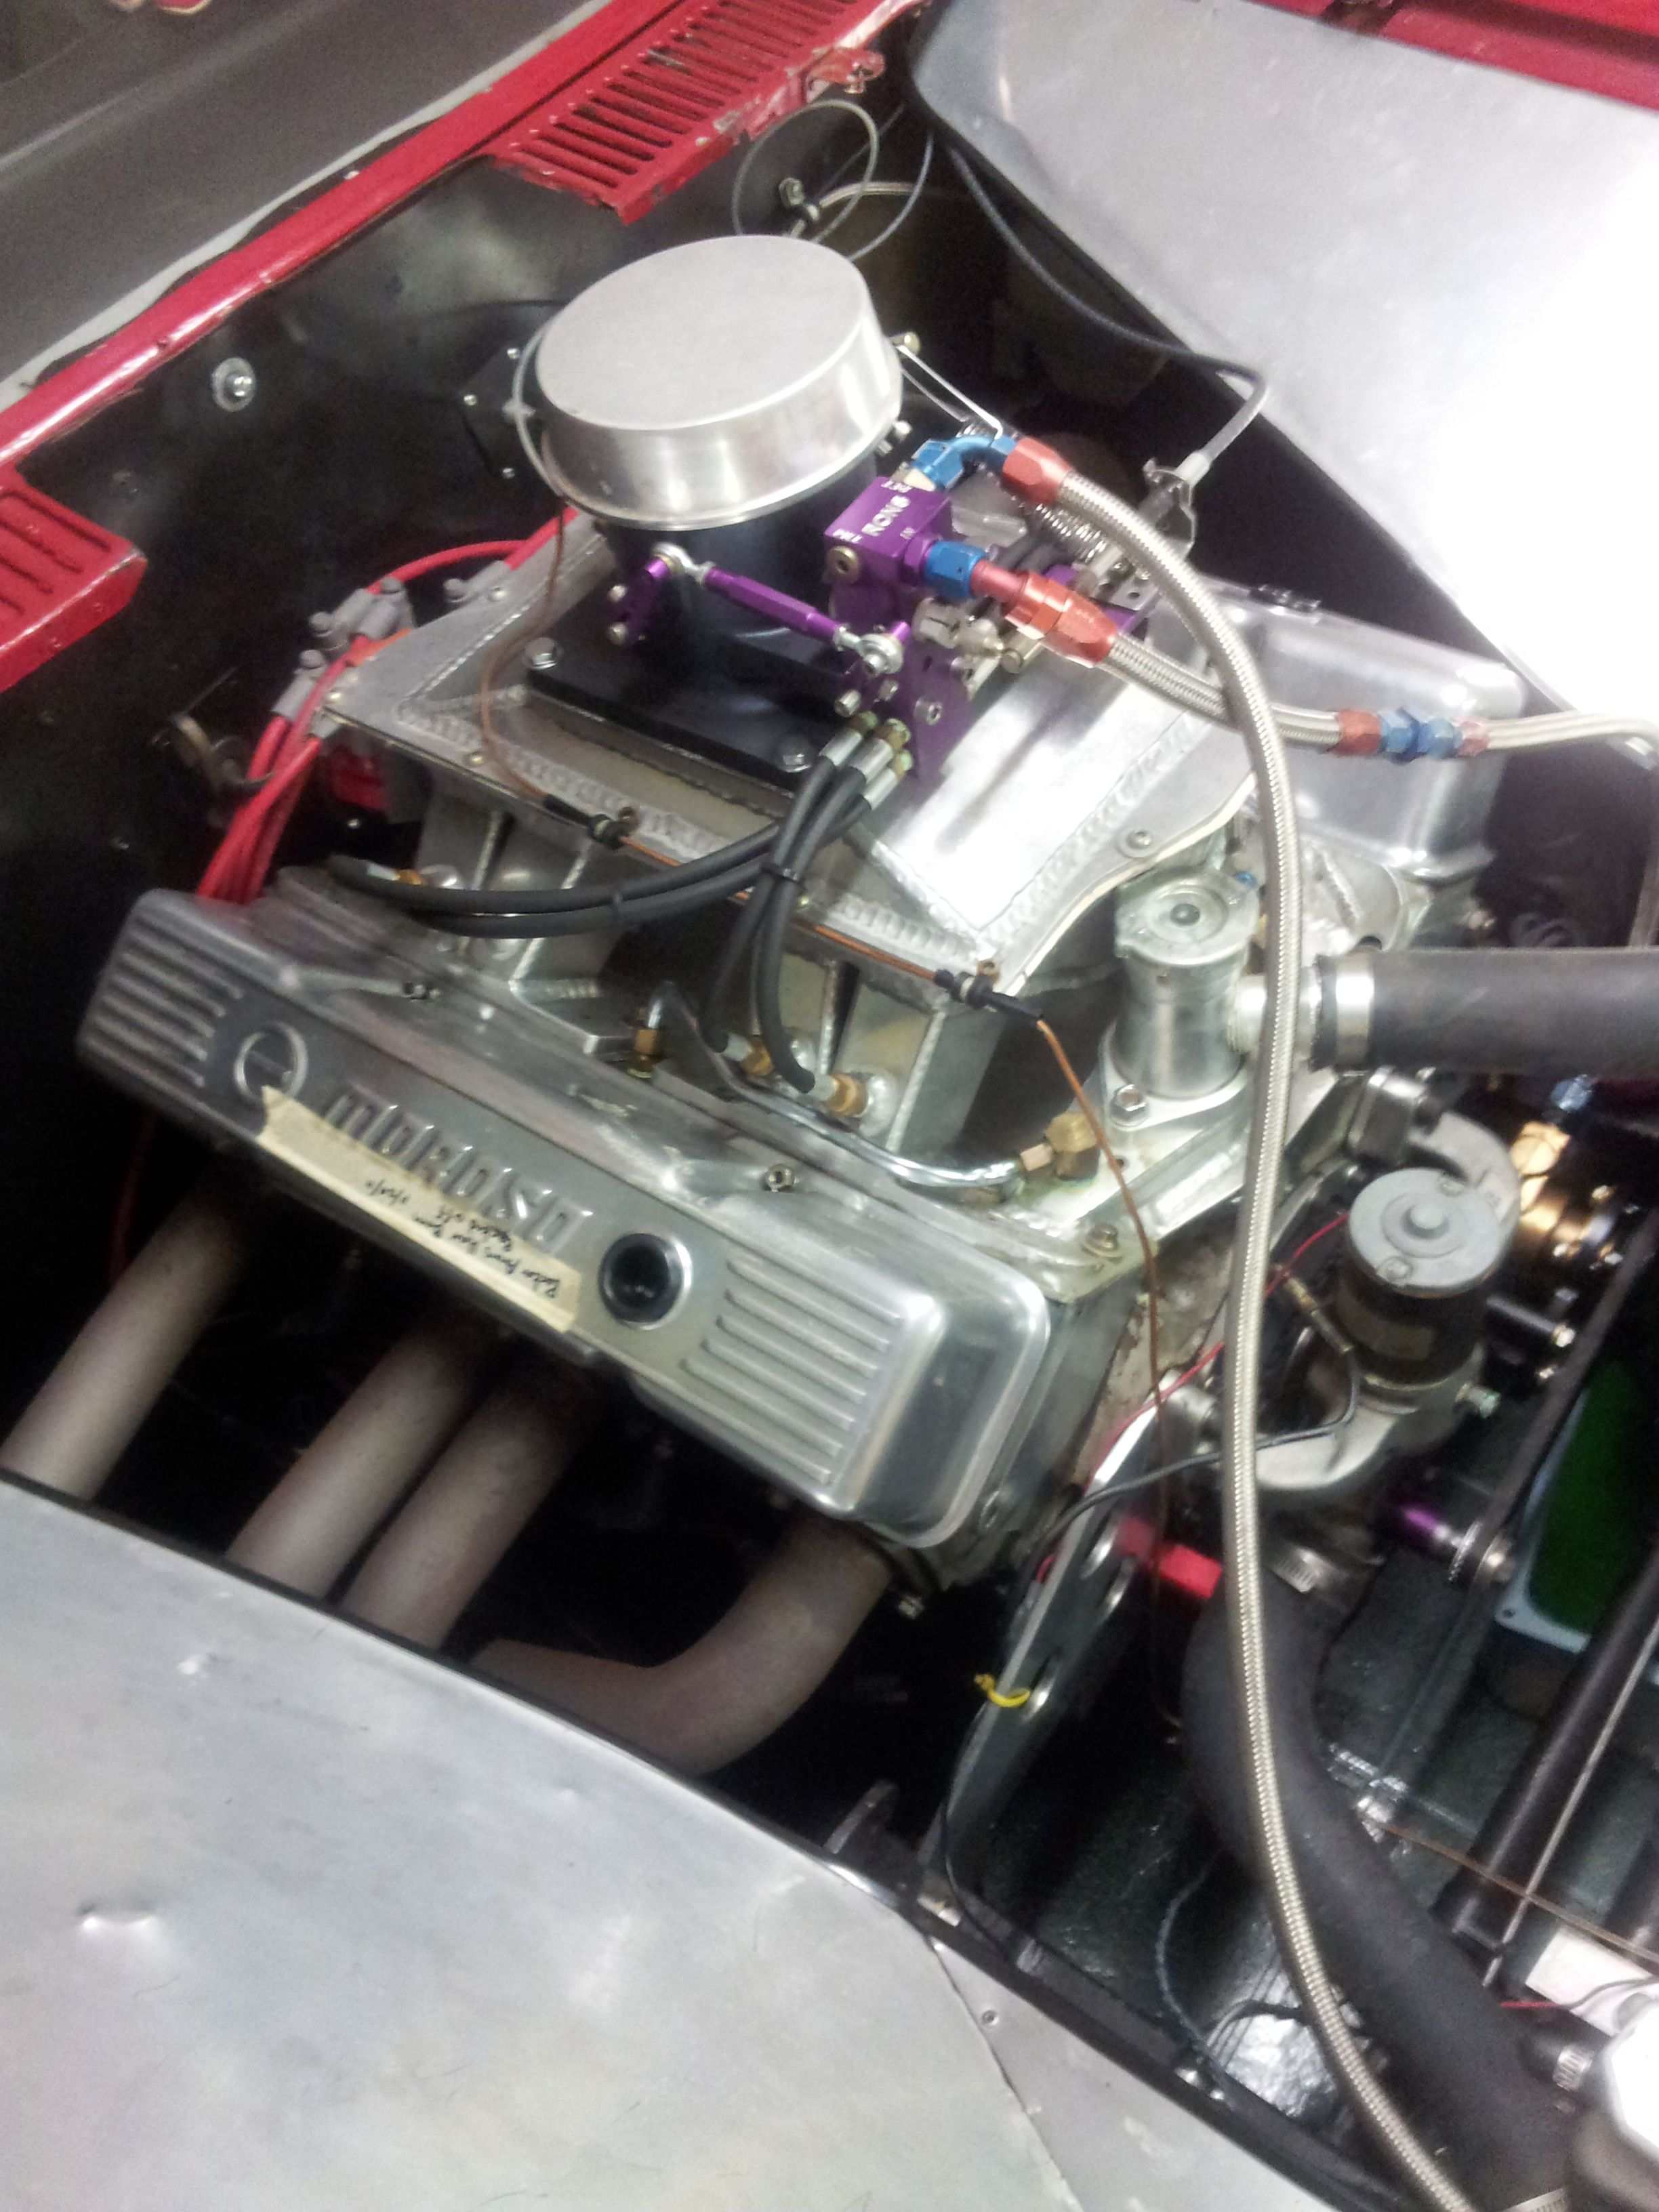 MY 1980 Chevy Monza   runs 8 60, 155mph in quarter!! Has a